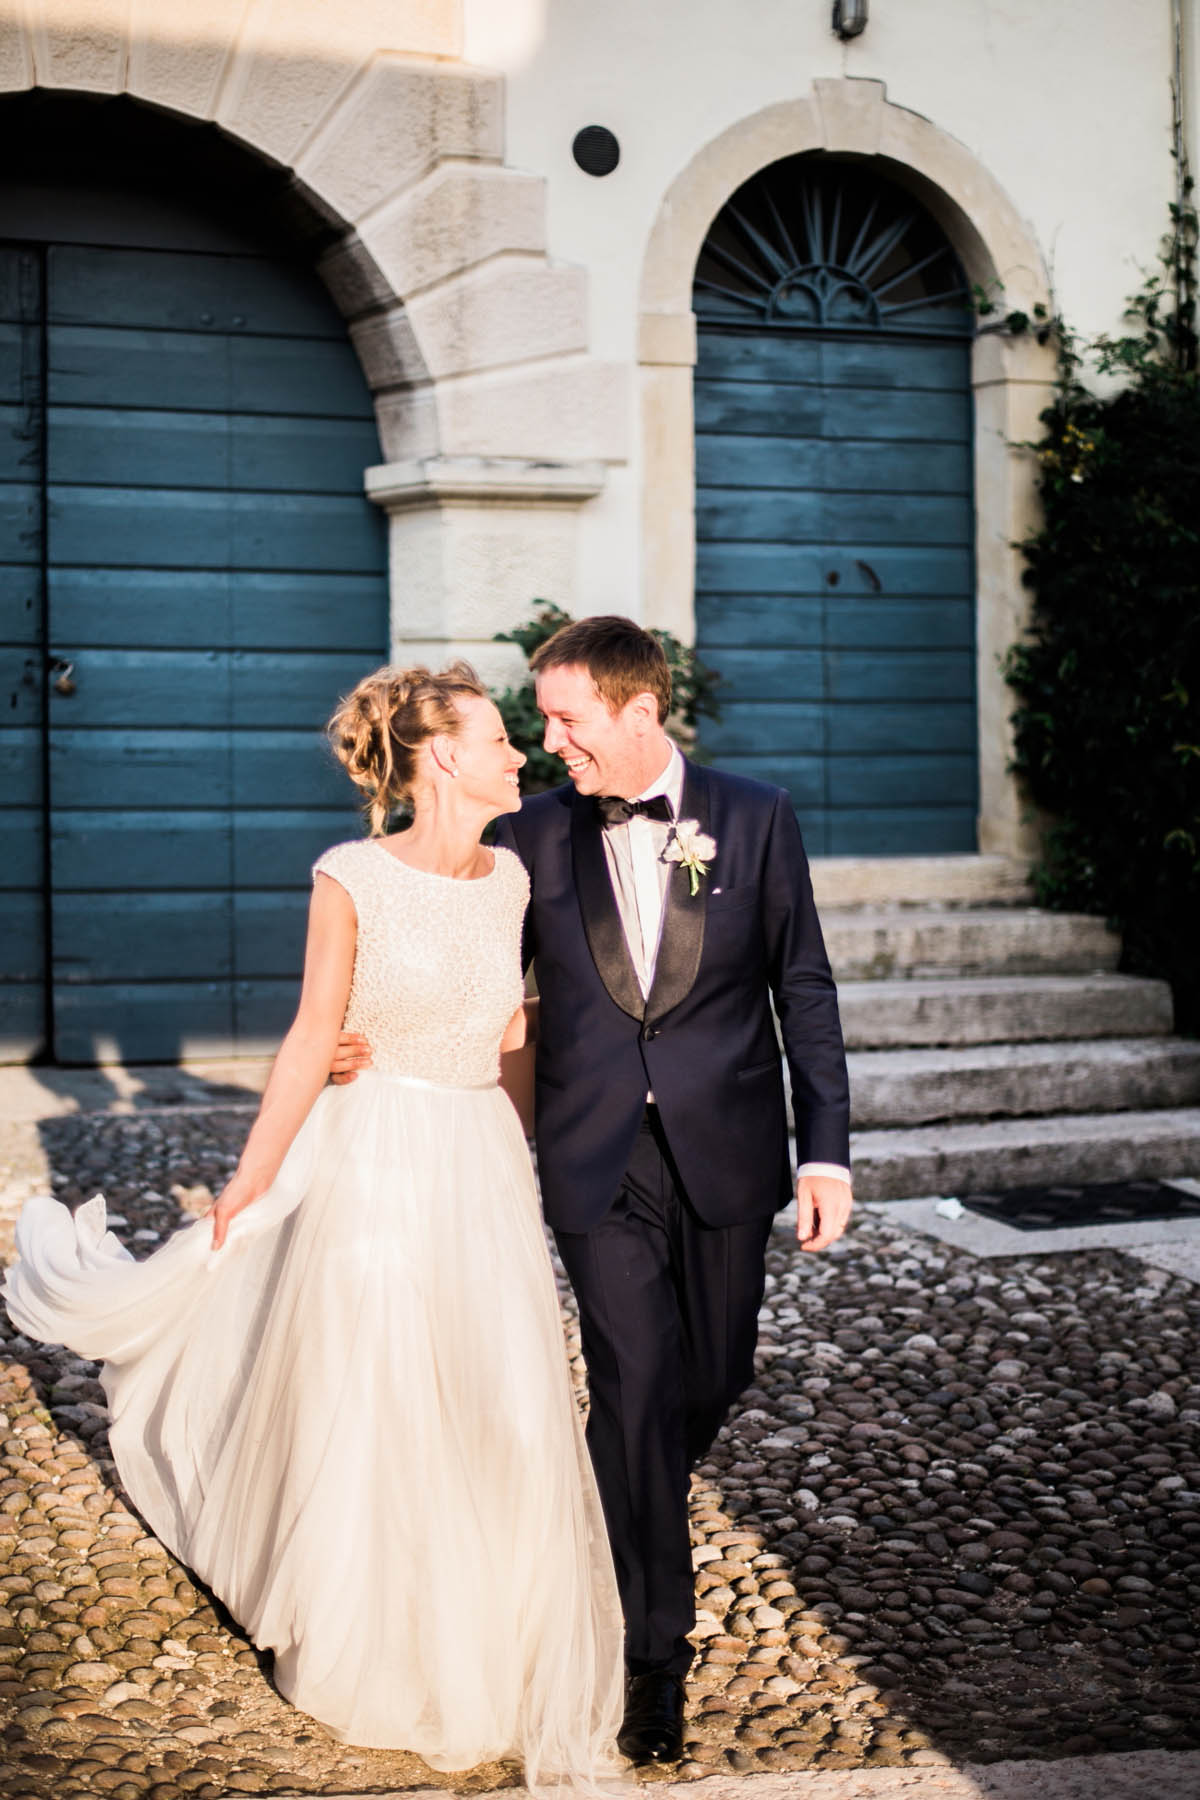 matrimonio moderno ispirato a new york